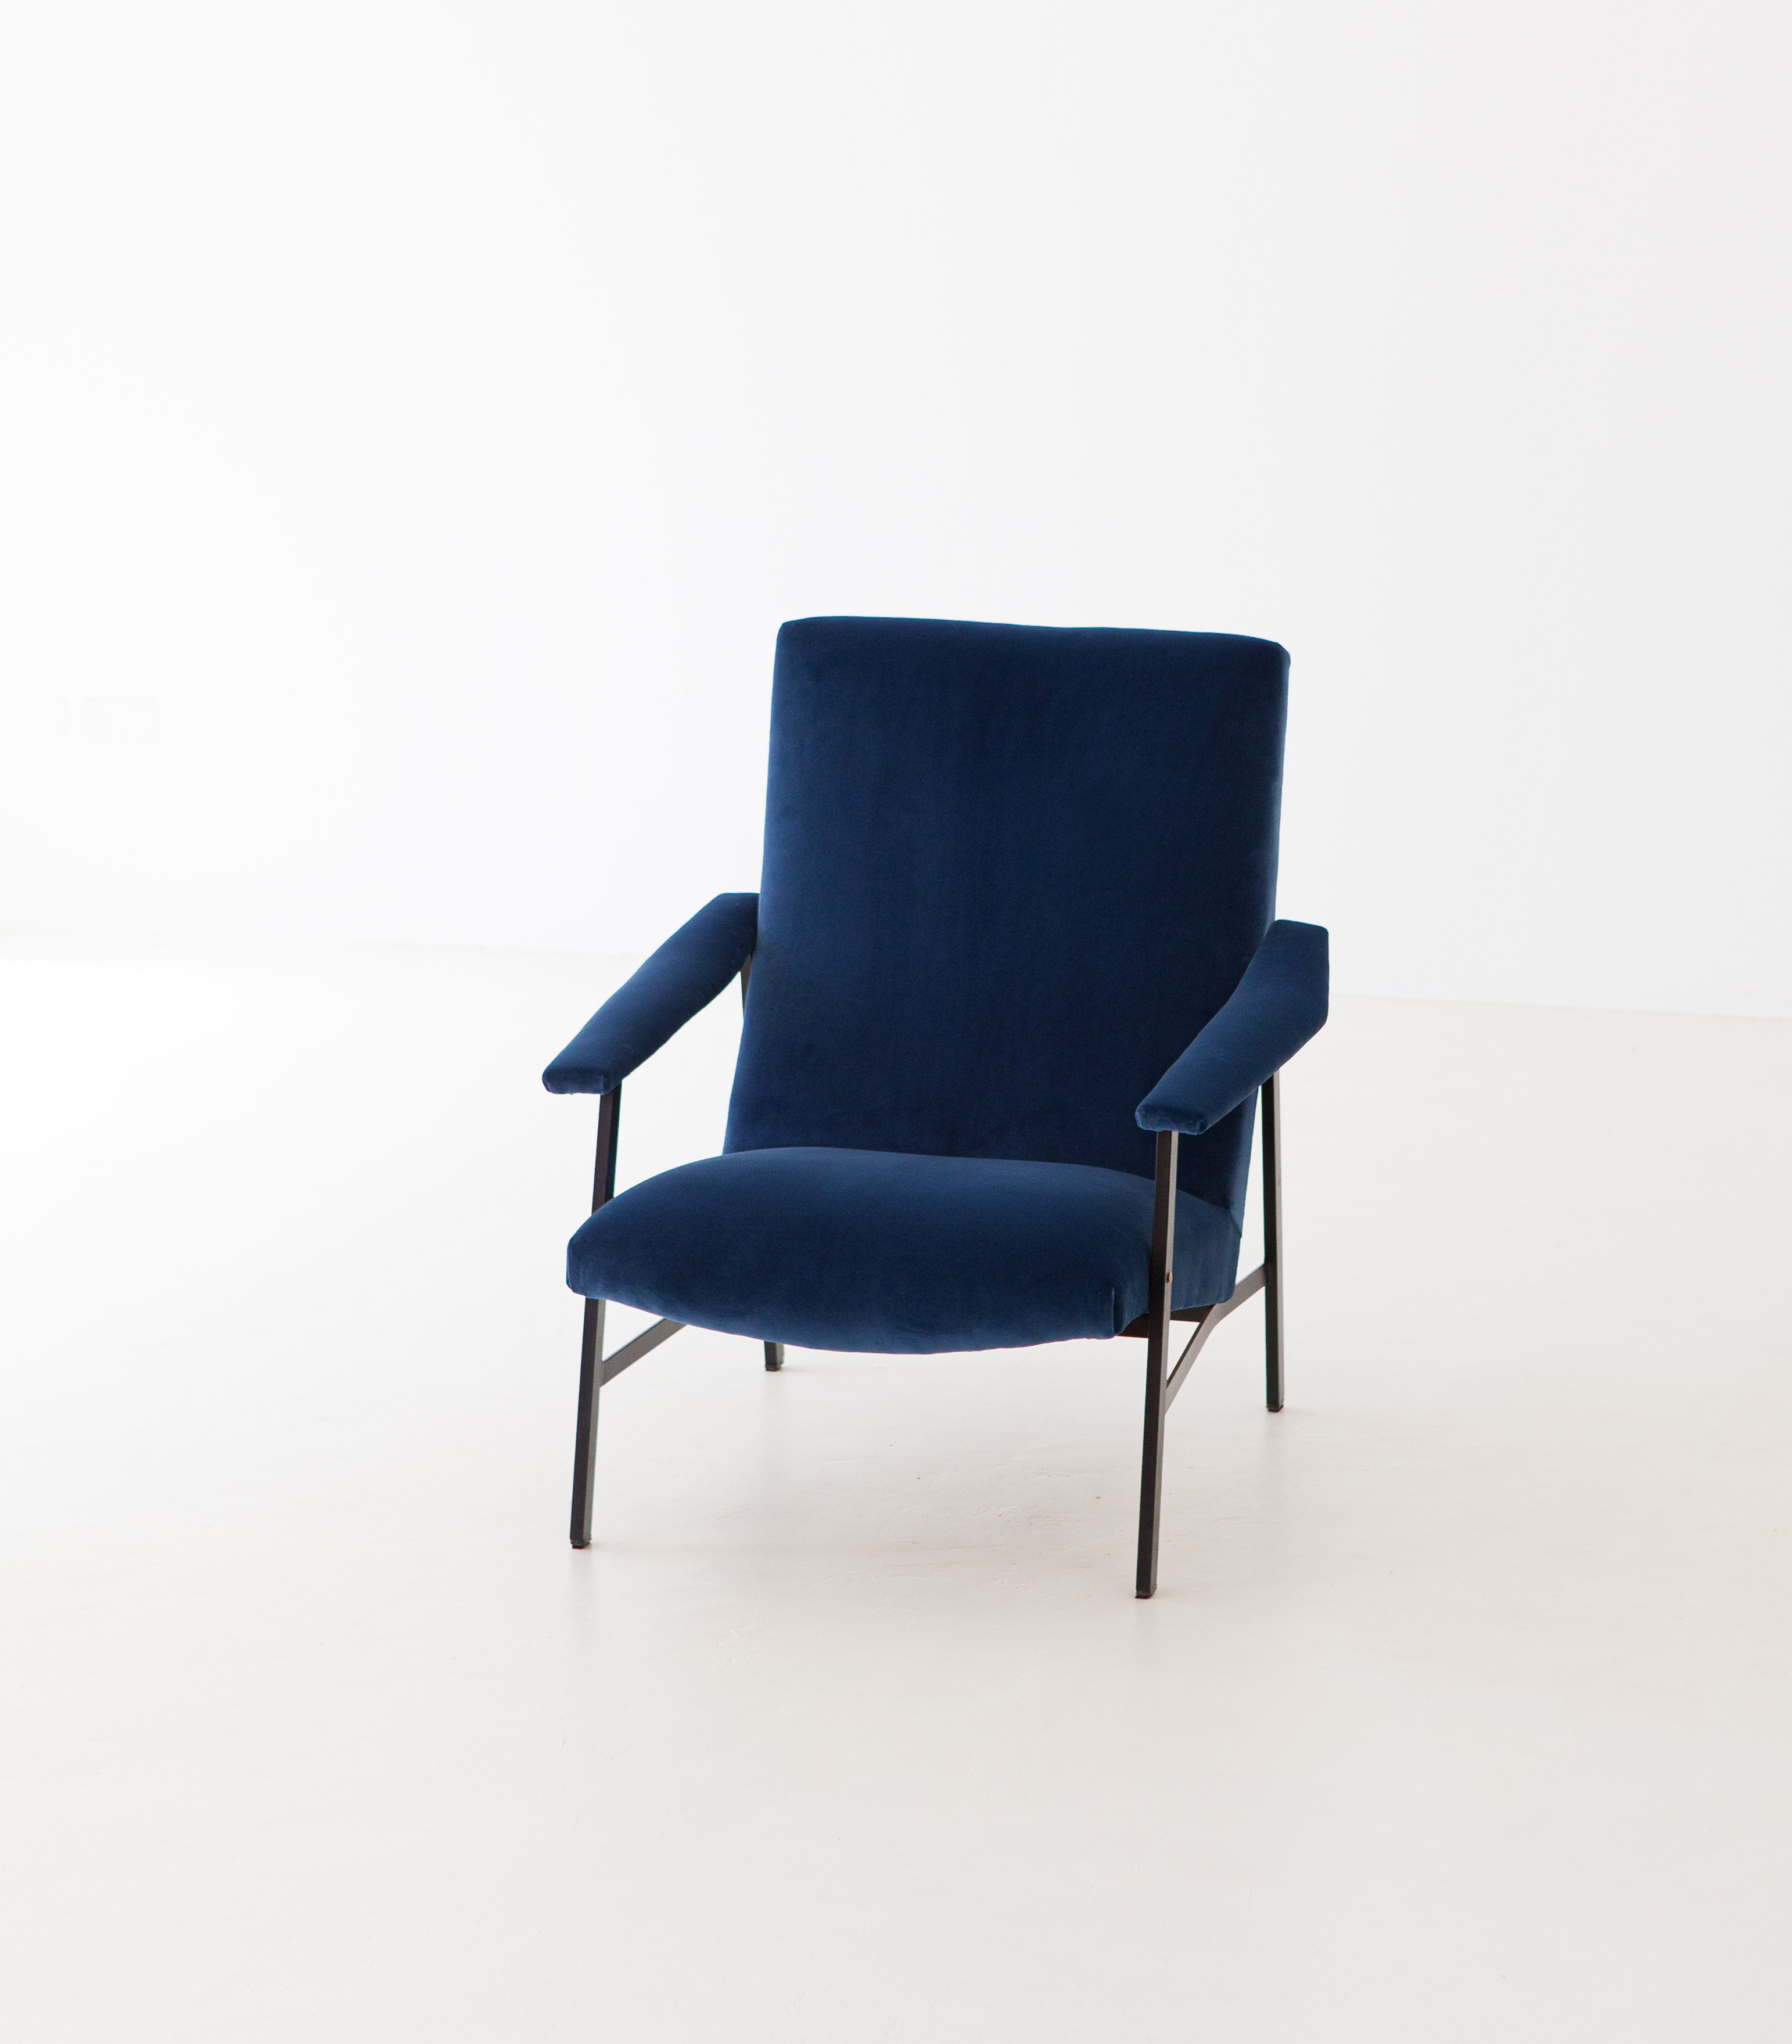 1950s-Italian-blu-velvet-lounge-armchair-4-SE295